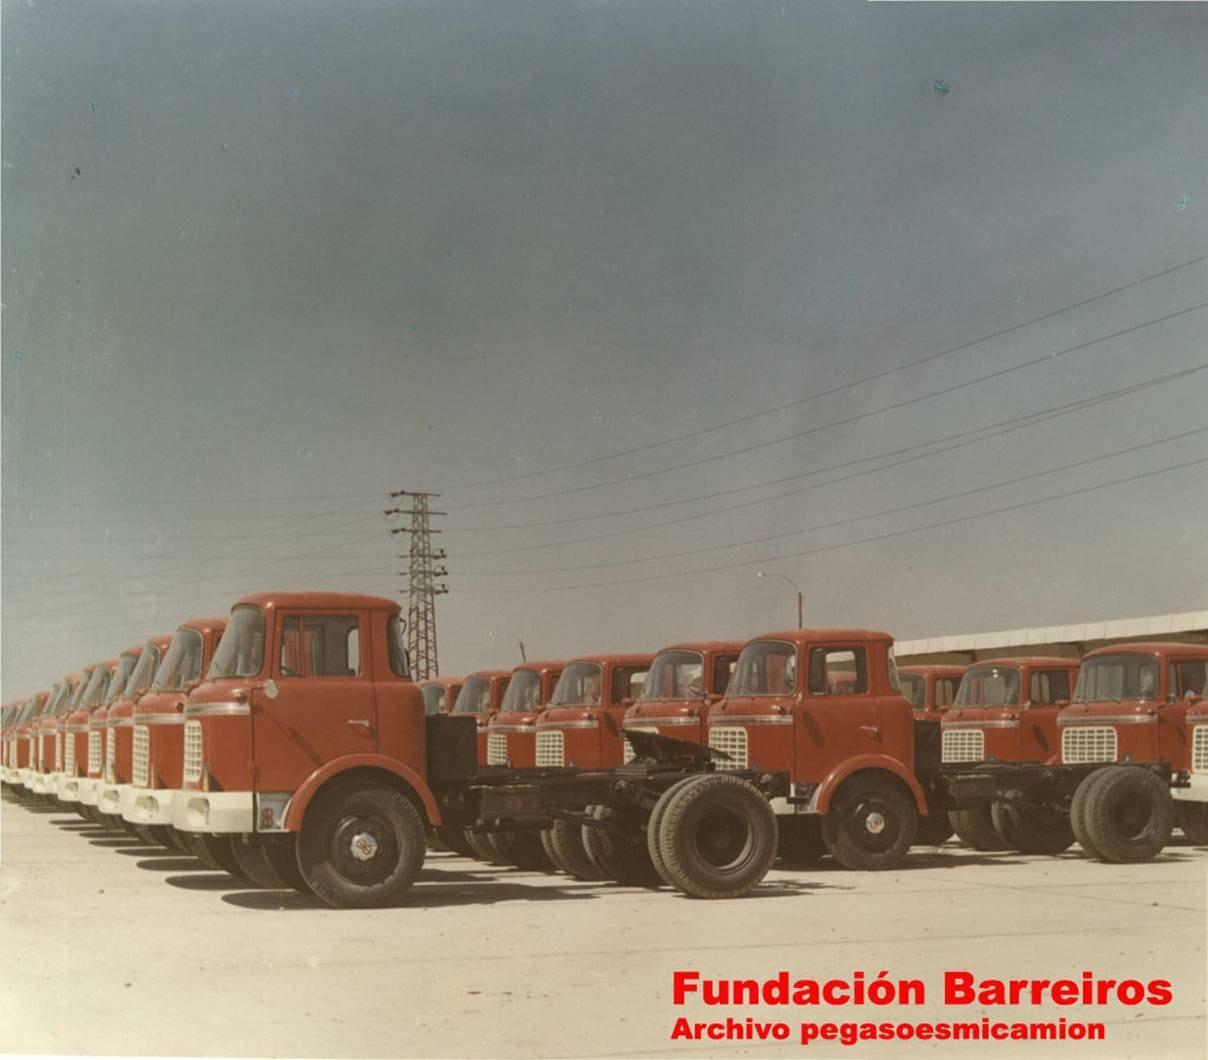 Barreiros-Camioes-(1)